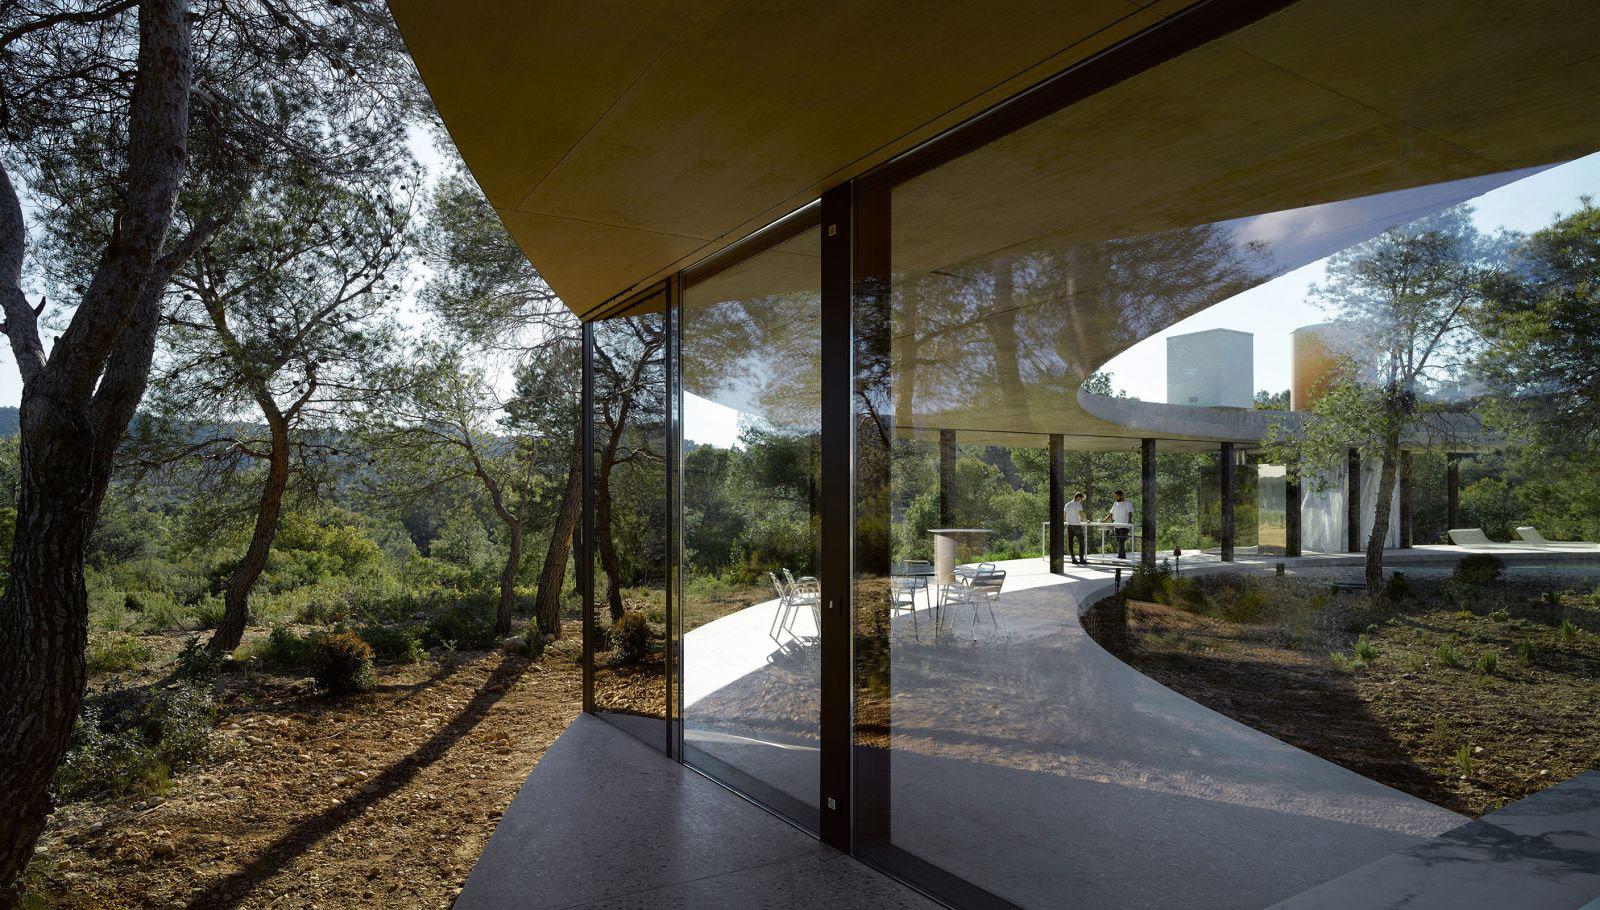 SOLO HOUSE OFFICE KGDVS - Aragon, Spain